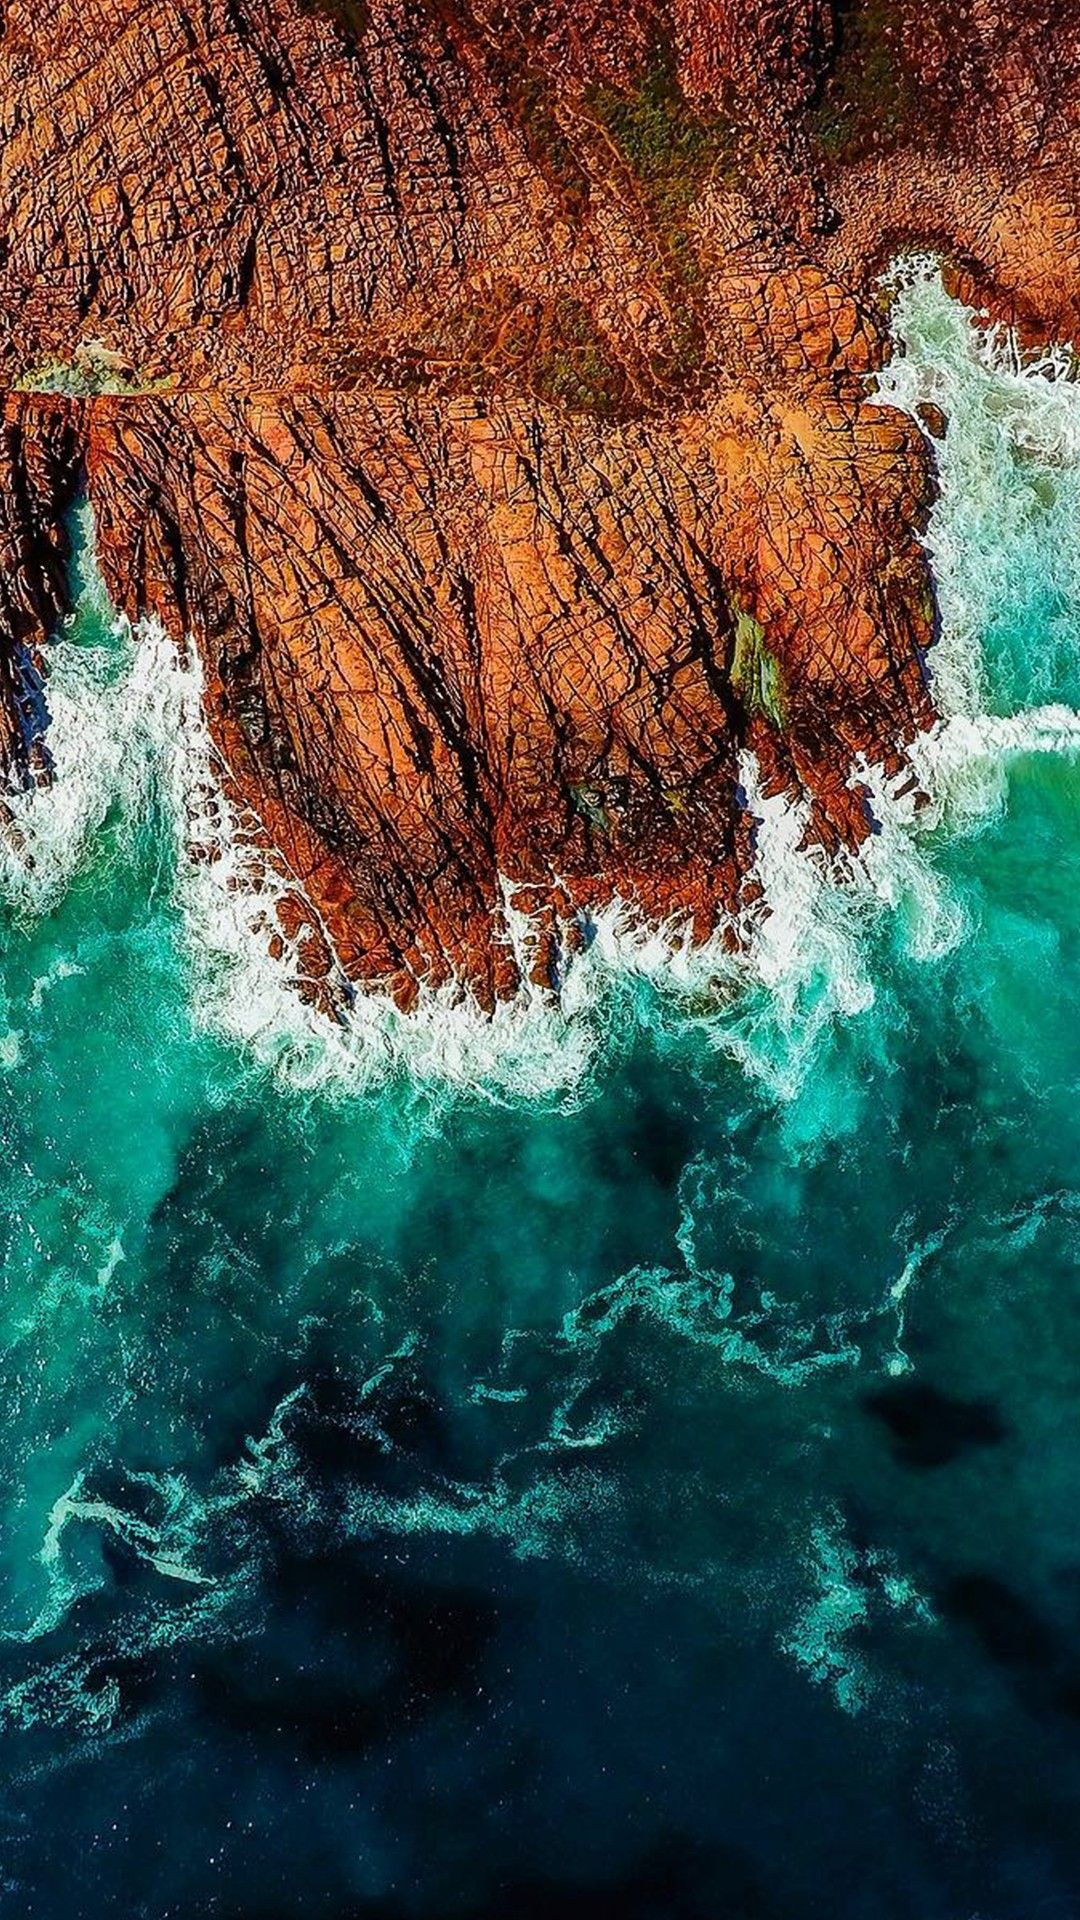 Iphone Wallpaper Ocean Waves